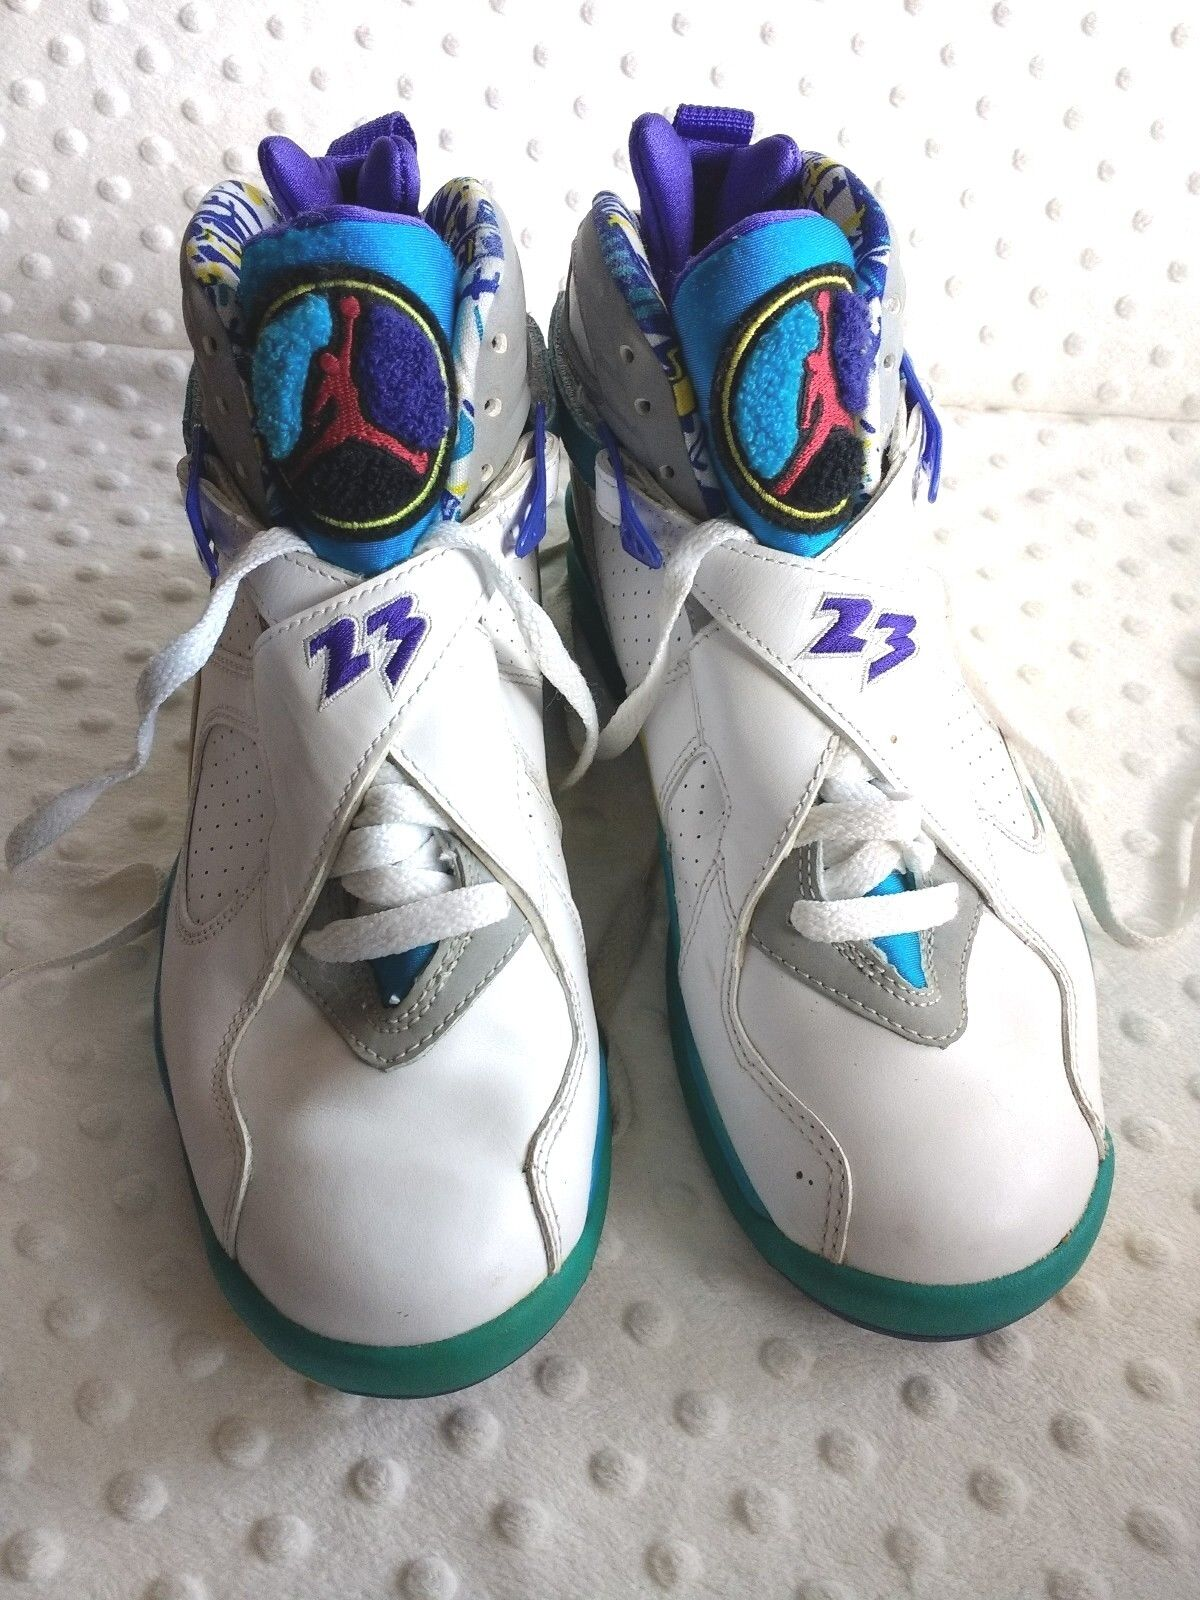 2007 nike air jordan viii retrò aqua sz basket rare le scarpe